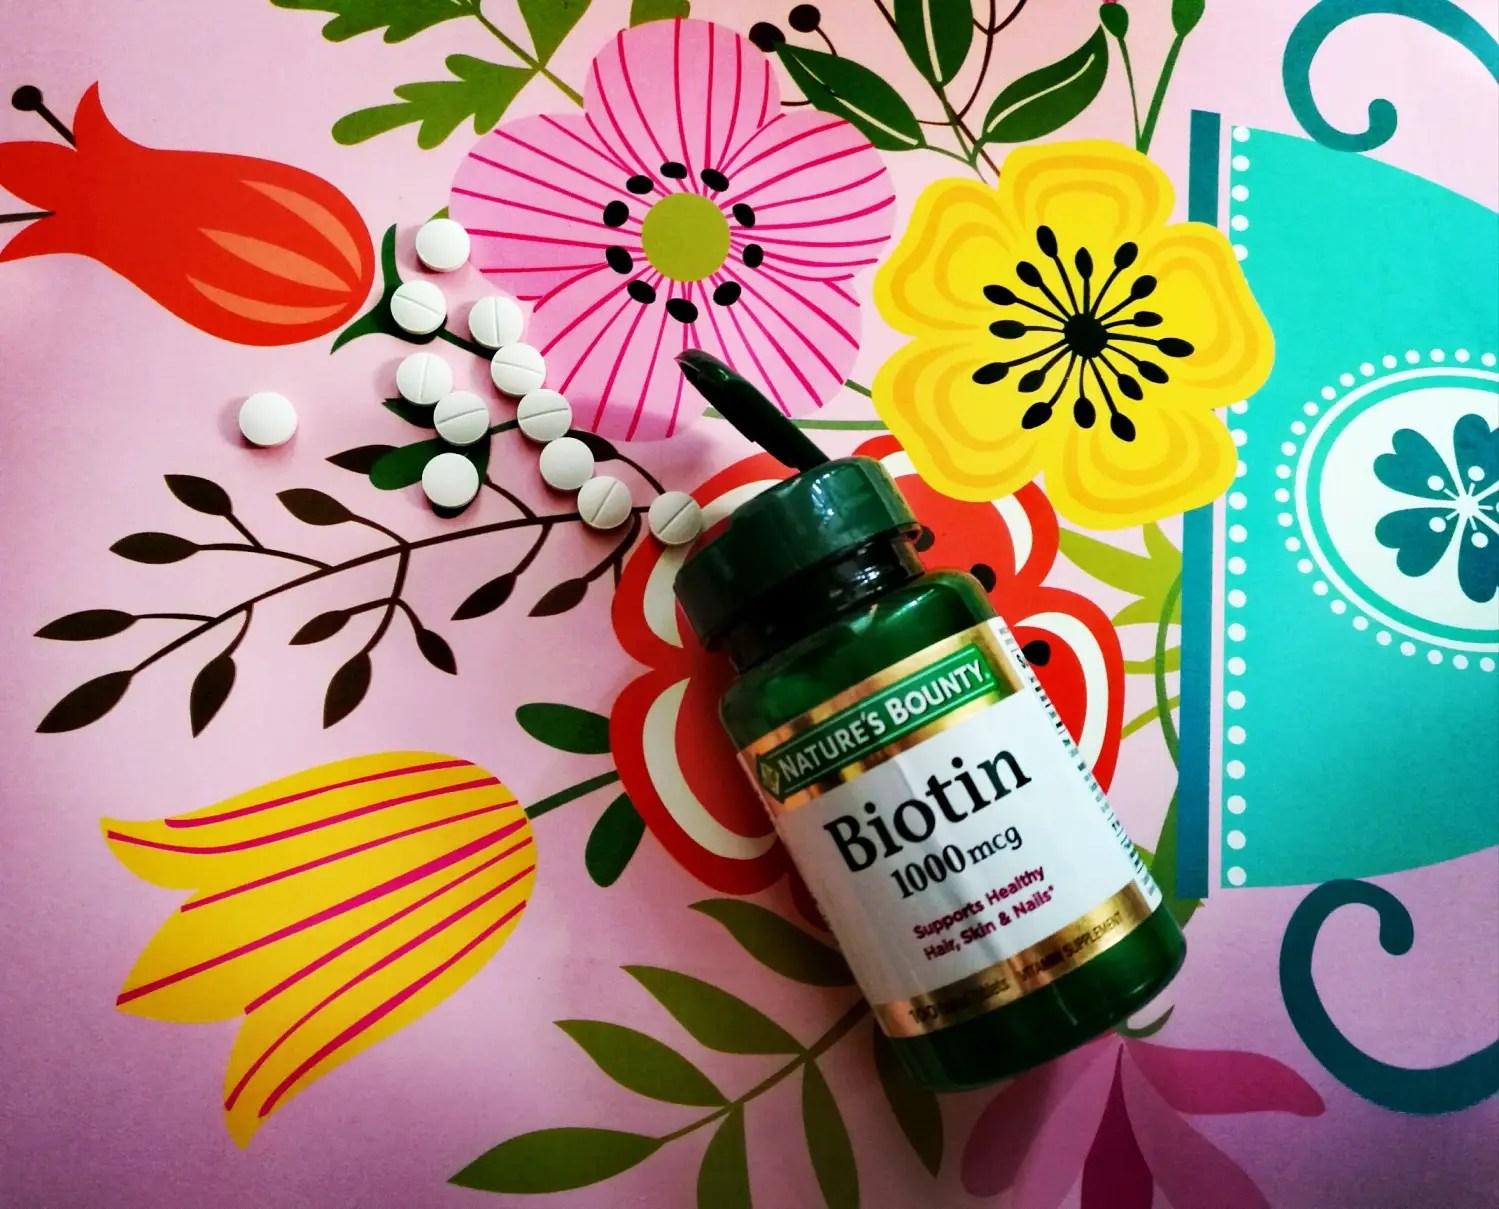 Nature's Bounty Biotin Review